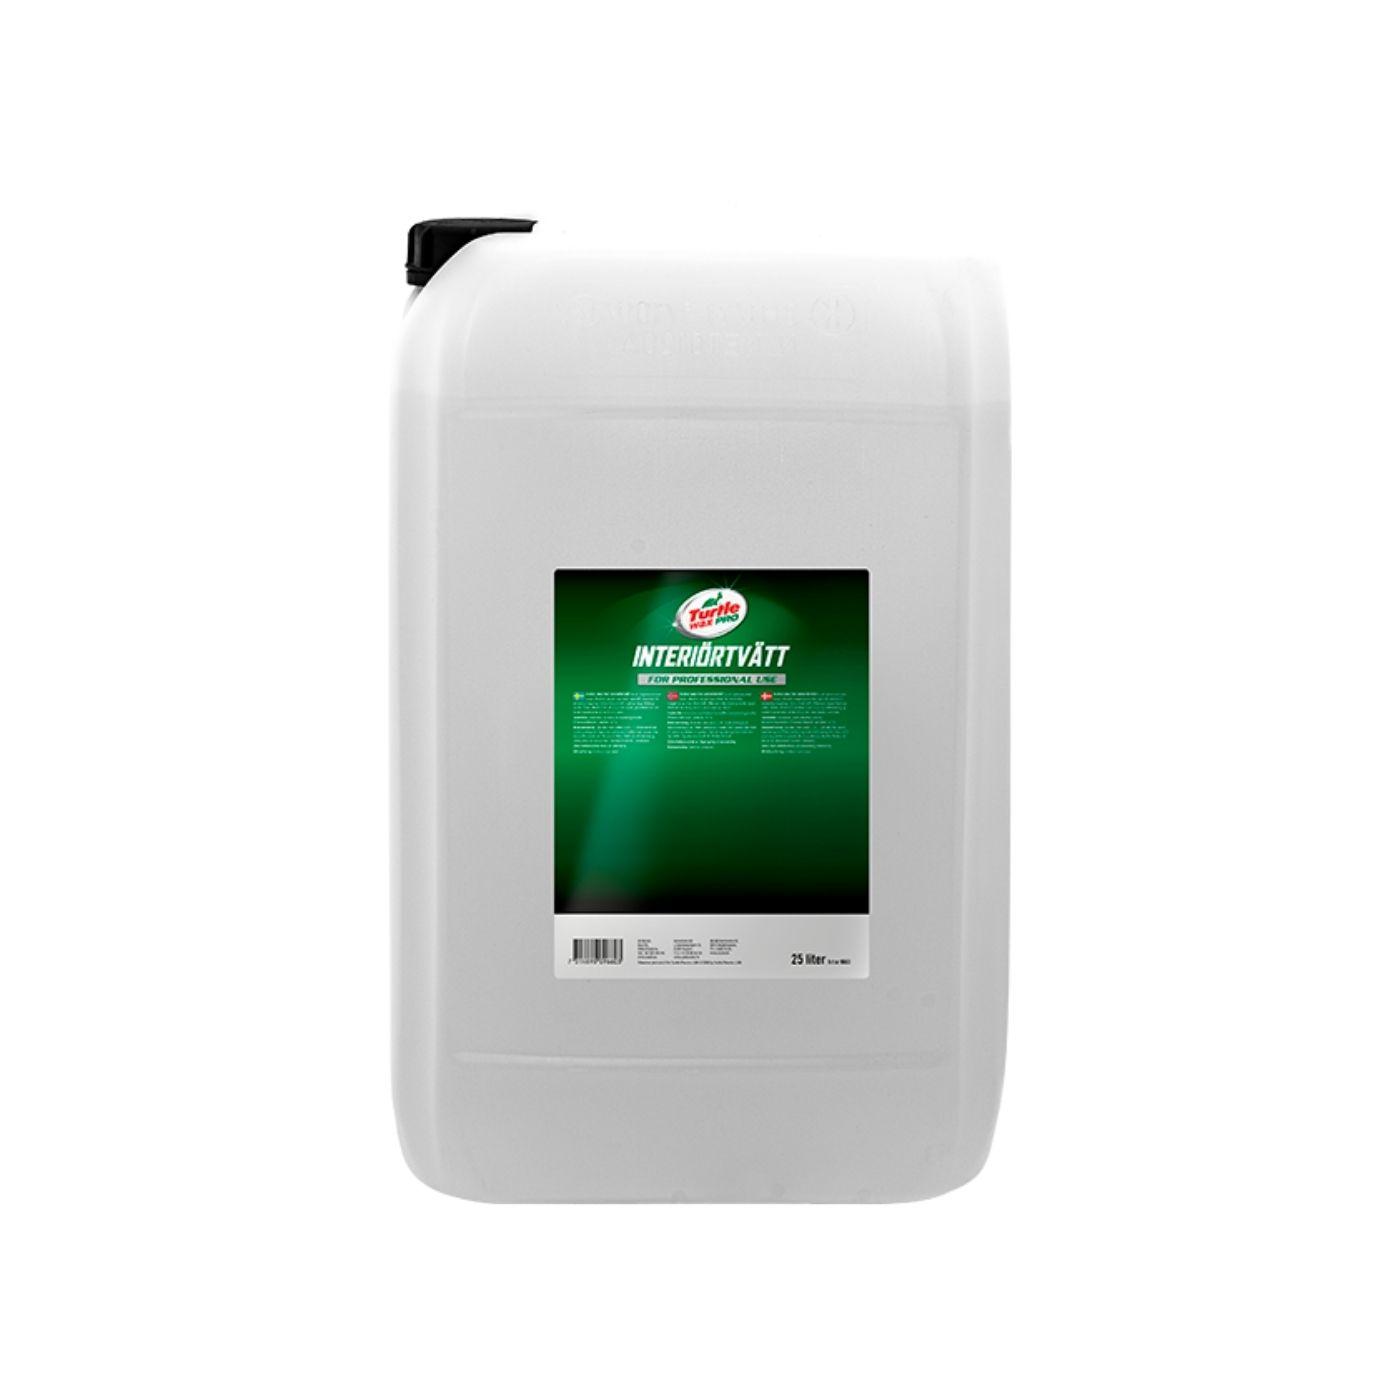 Interiörrengöring Turtle Wax Pro Interiörtvätt, 25000 ml